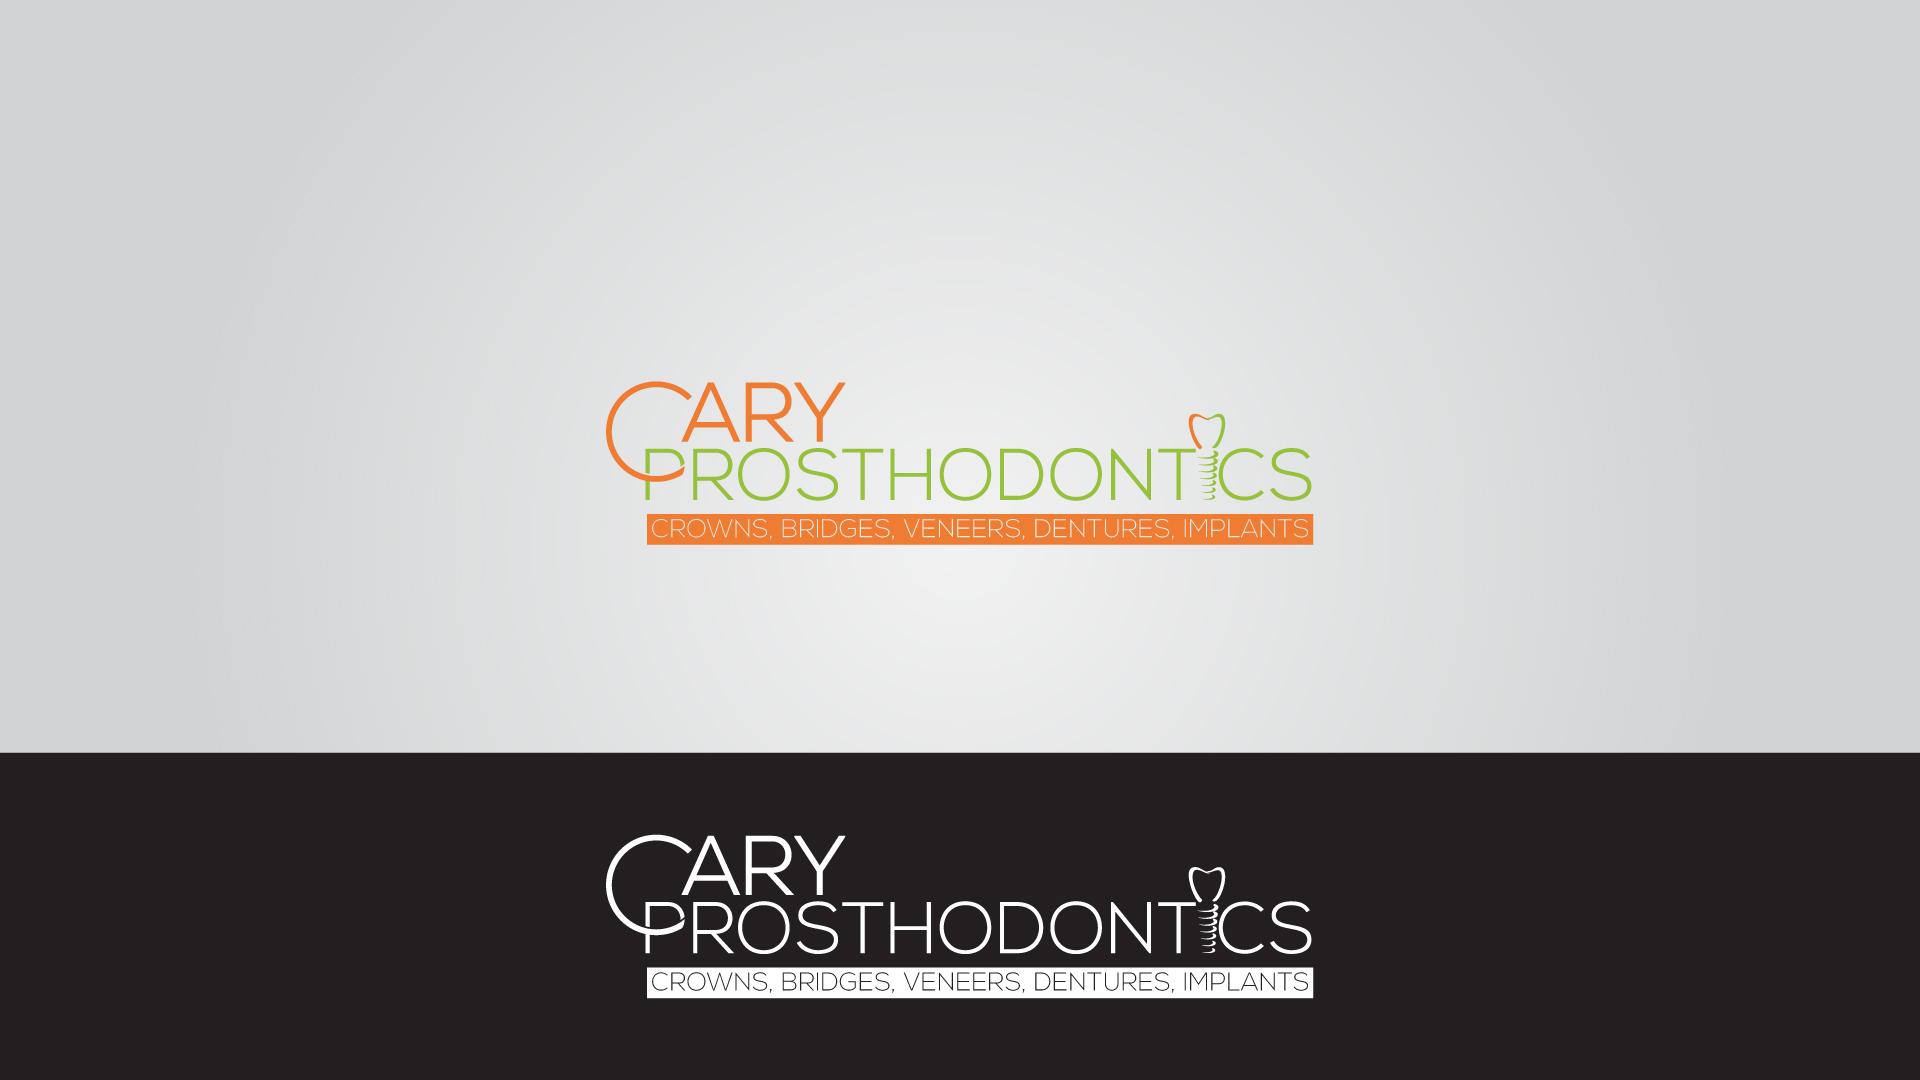 Logo Design by MD SHOHIDUL ISLAM - Entry No. 193 in the Logo Design Contest Cary Prosthodontics Logo Design.